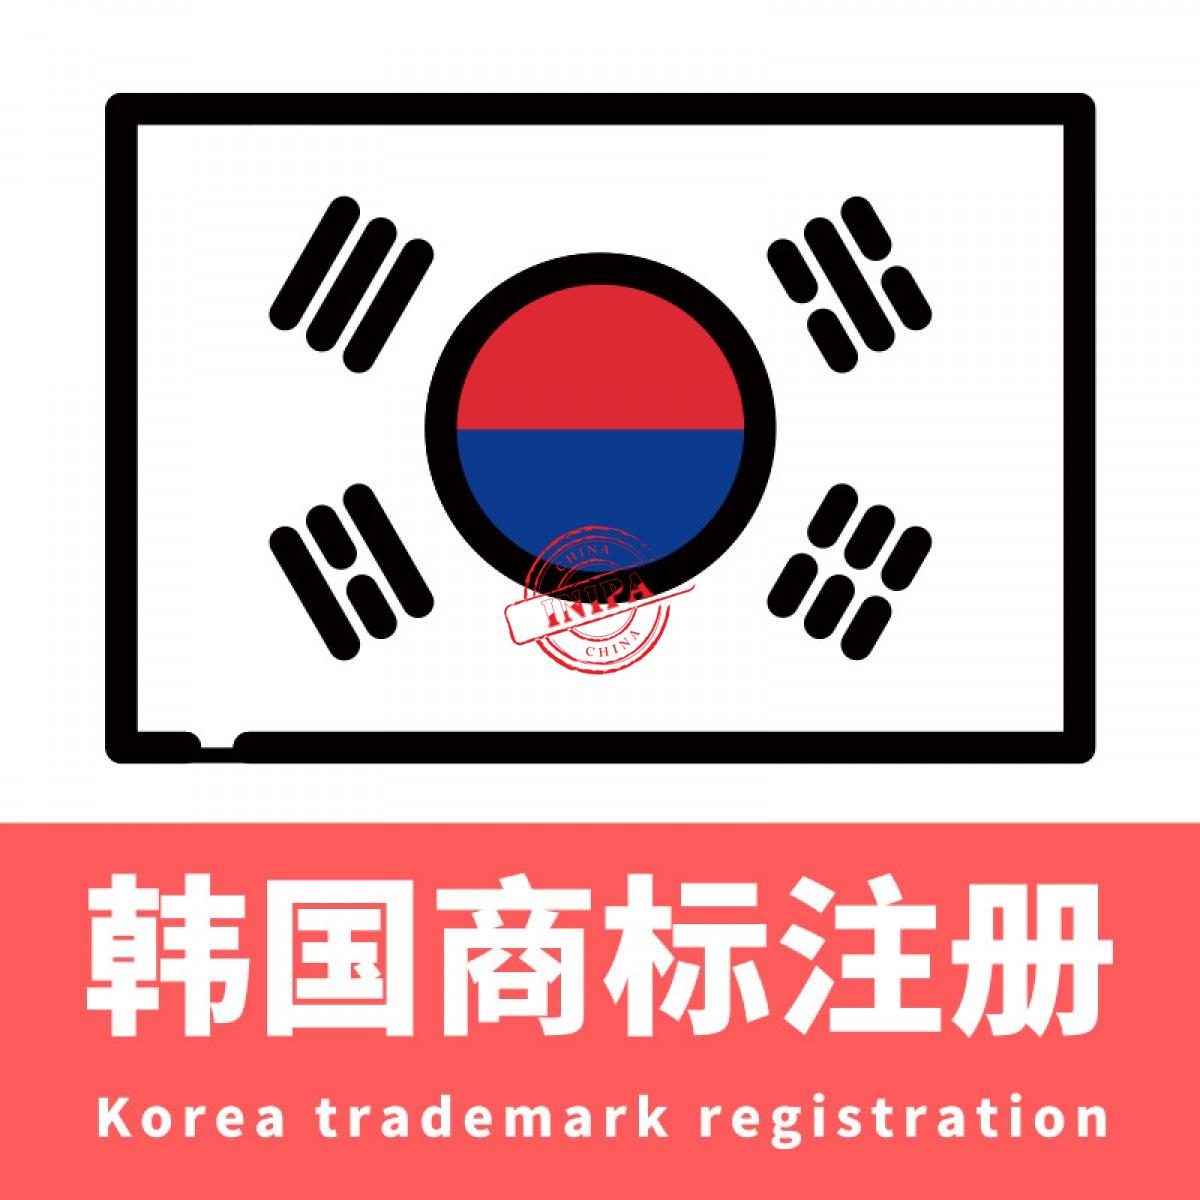 韩国商标注册 / Korea trademark registration